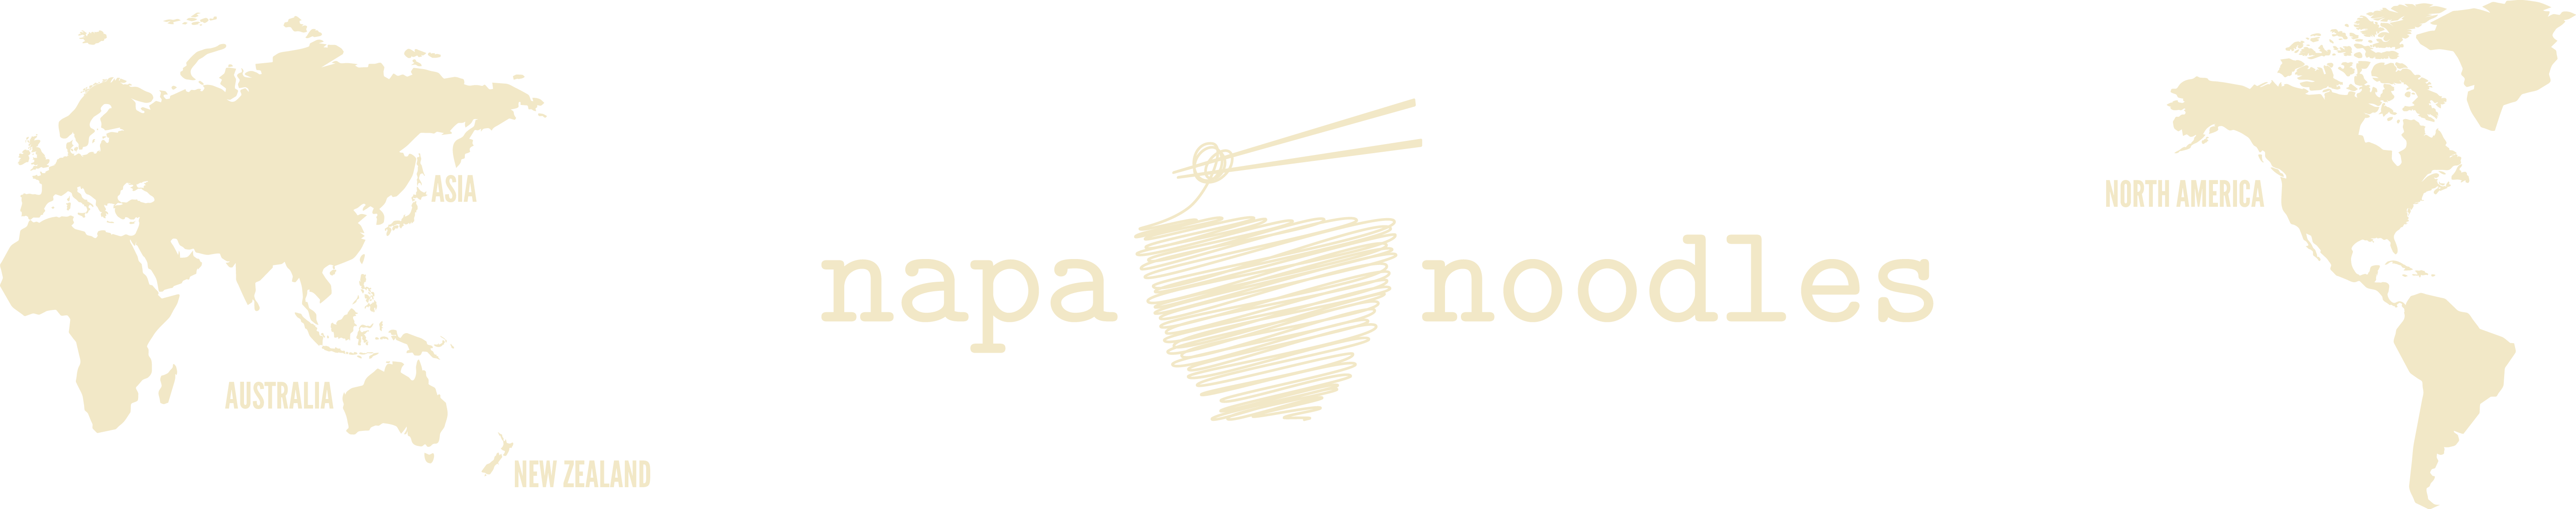 napa noodles